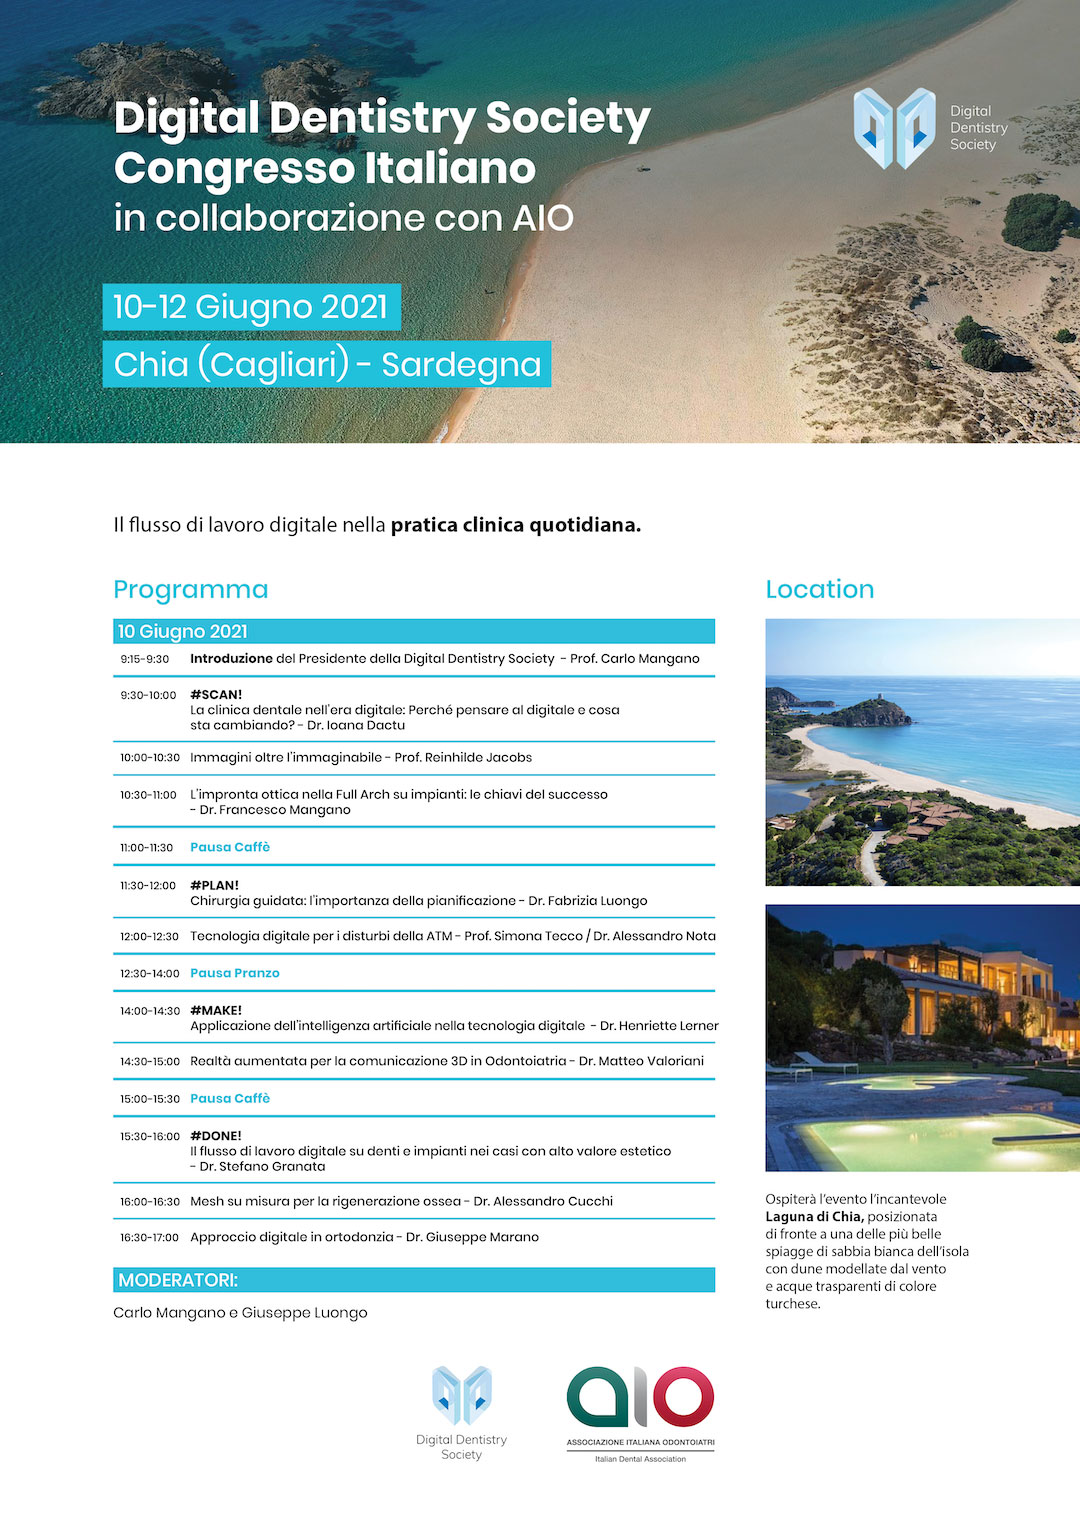 Programma Digital Dentistry Society Congresso Italiano